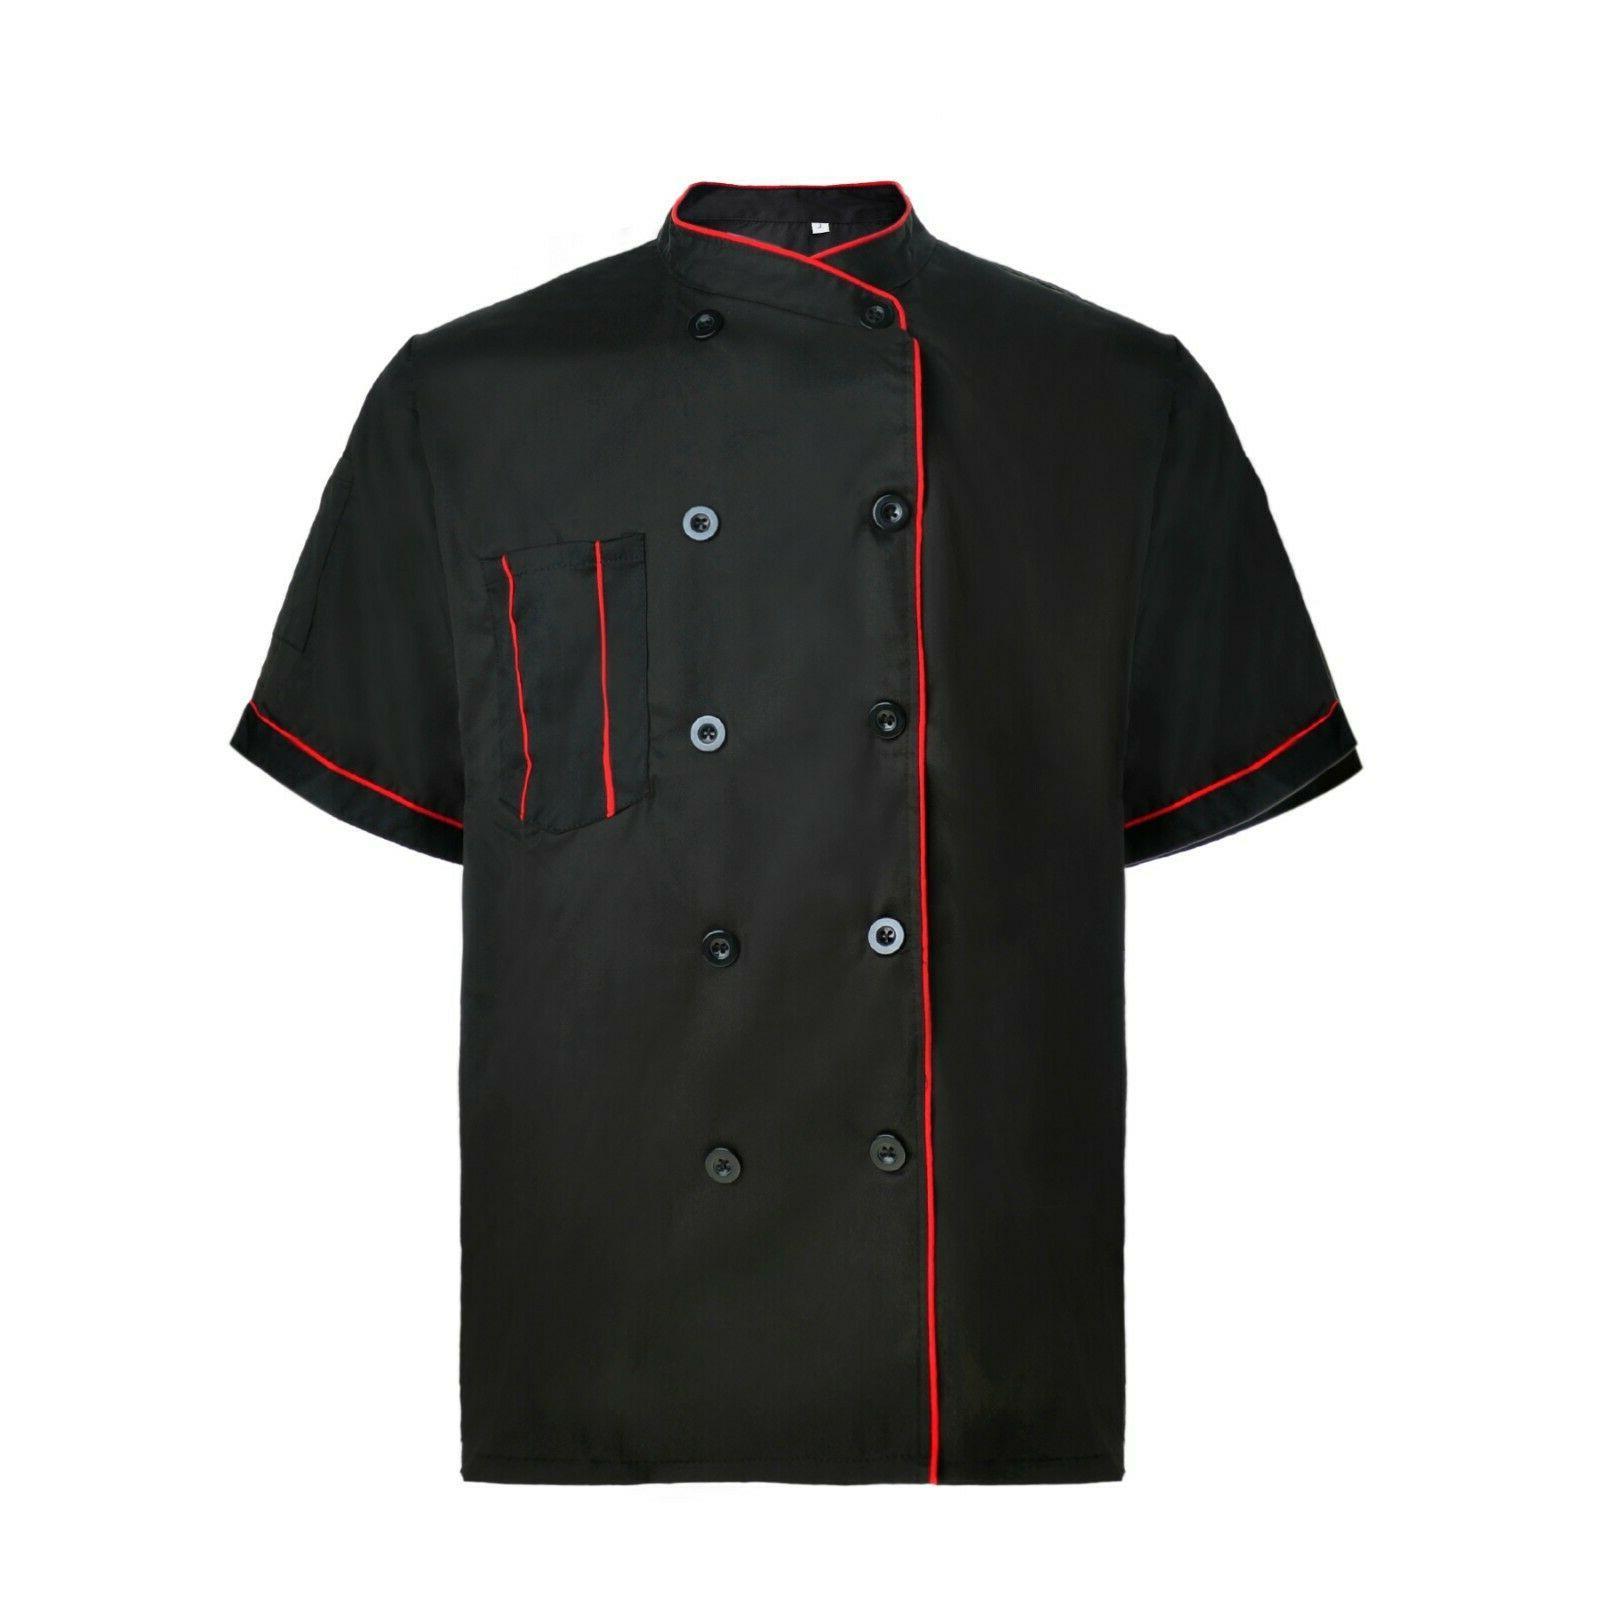 TopTie Short Coat Jacket Unisex Kitchen Cooking